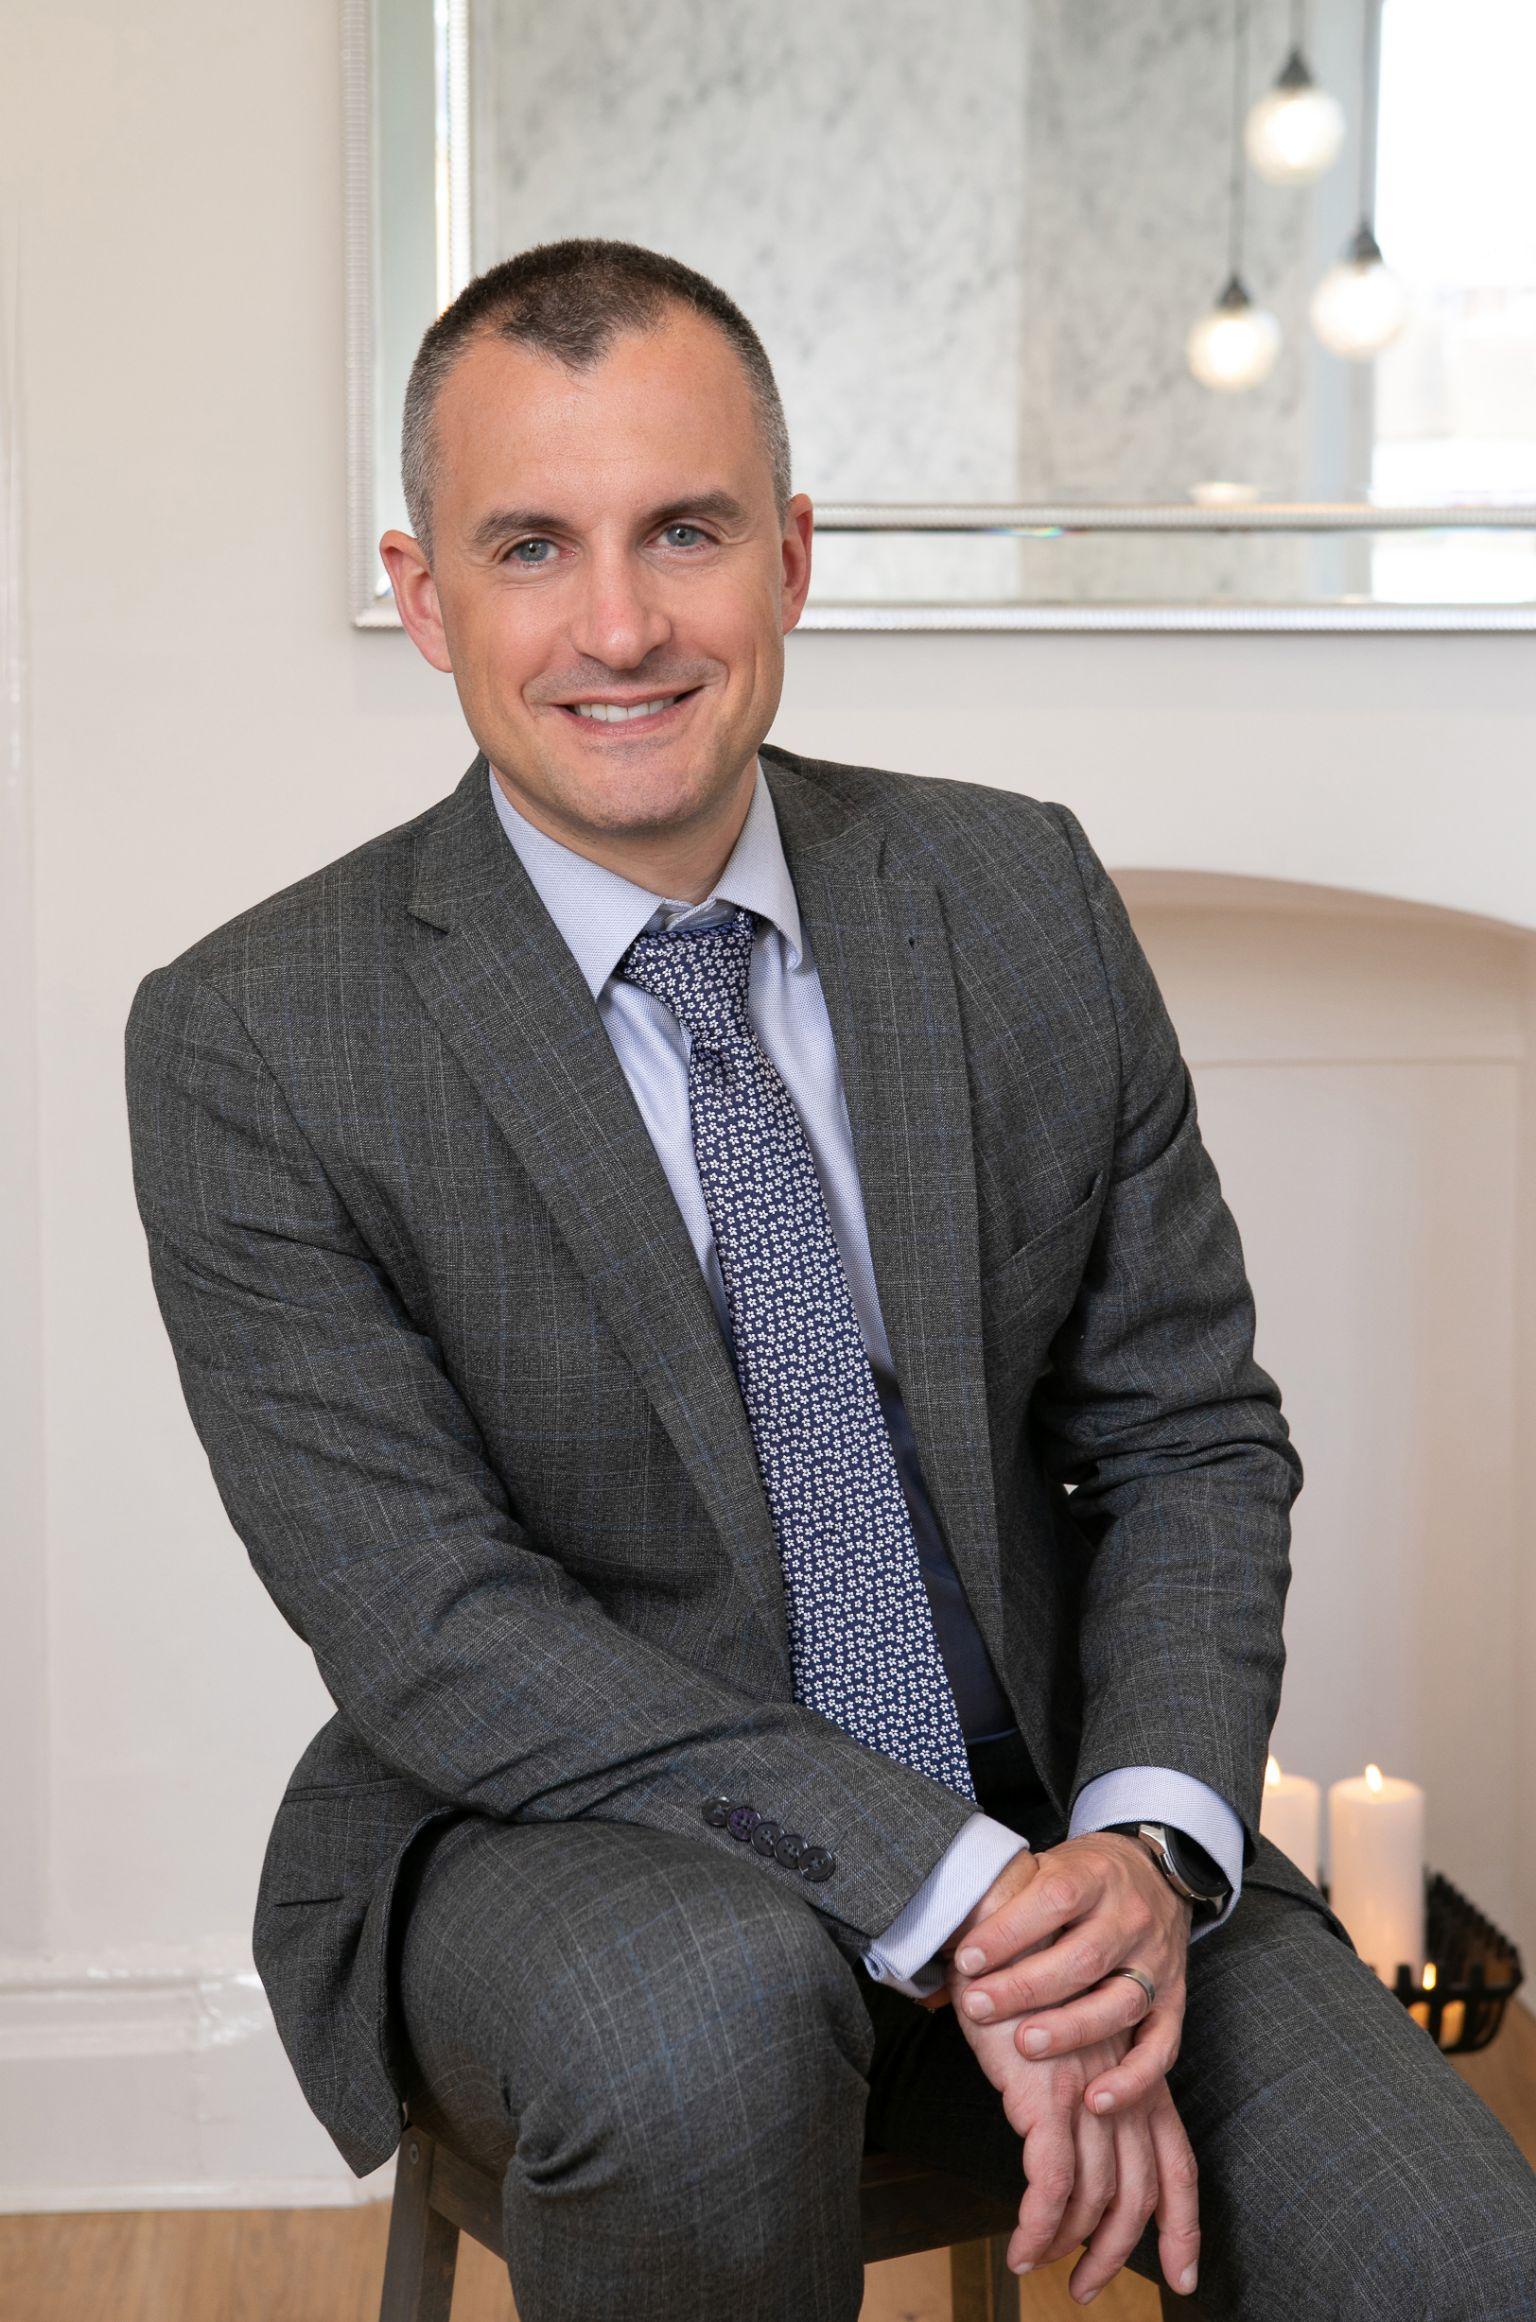 Fulvio Urso-Baiarda Best UK Plastic Surgeon